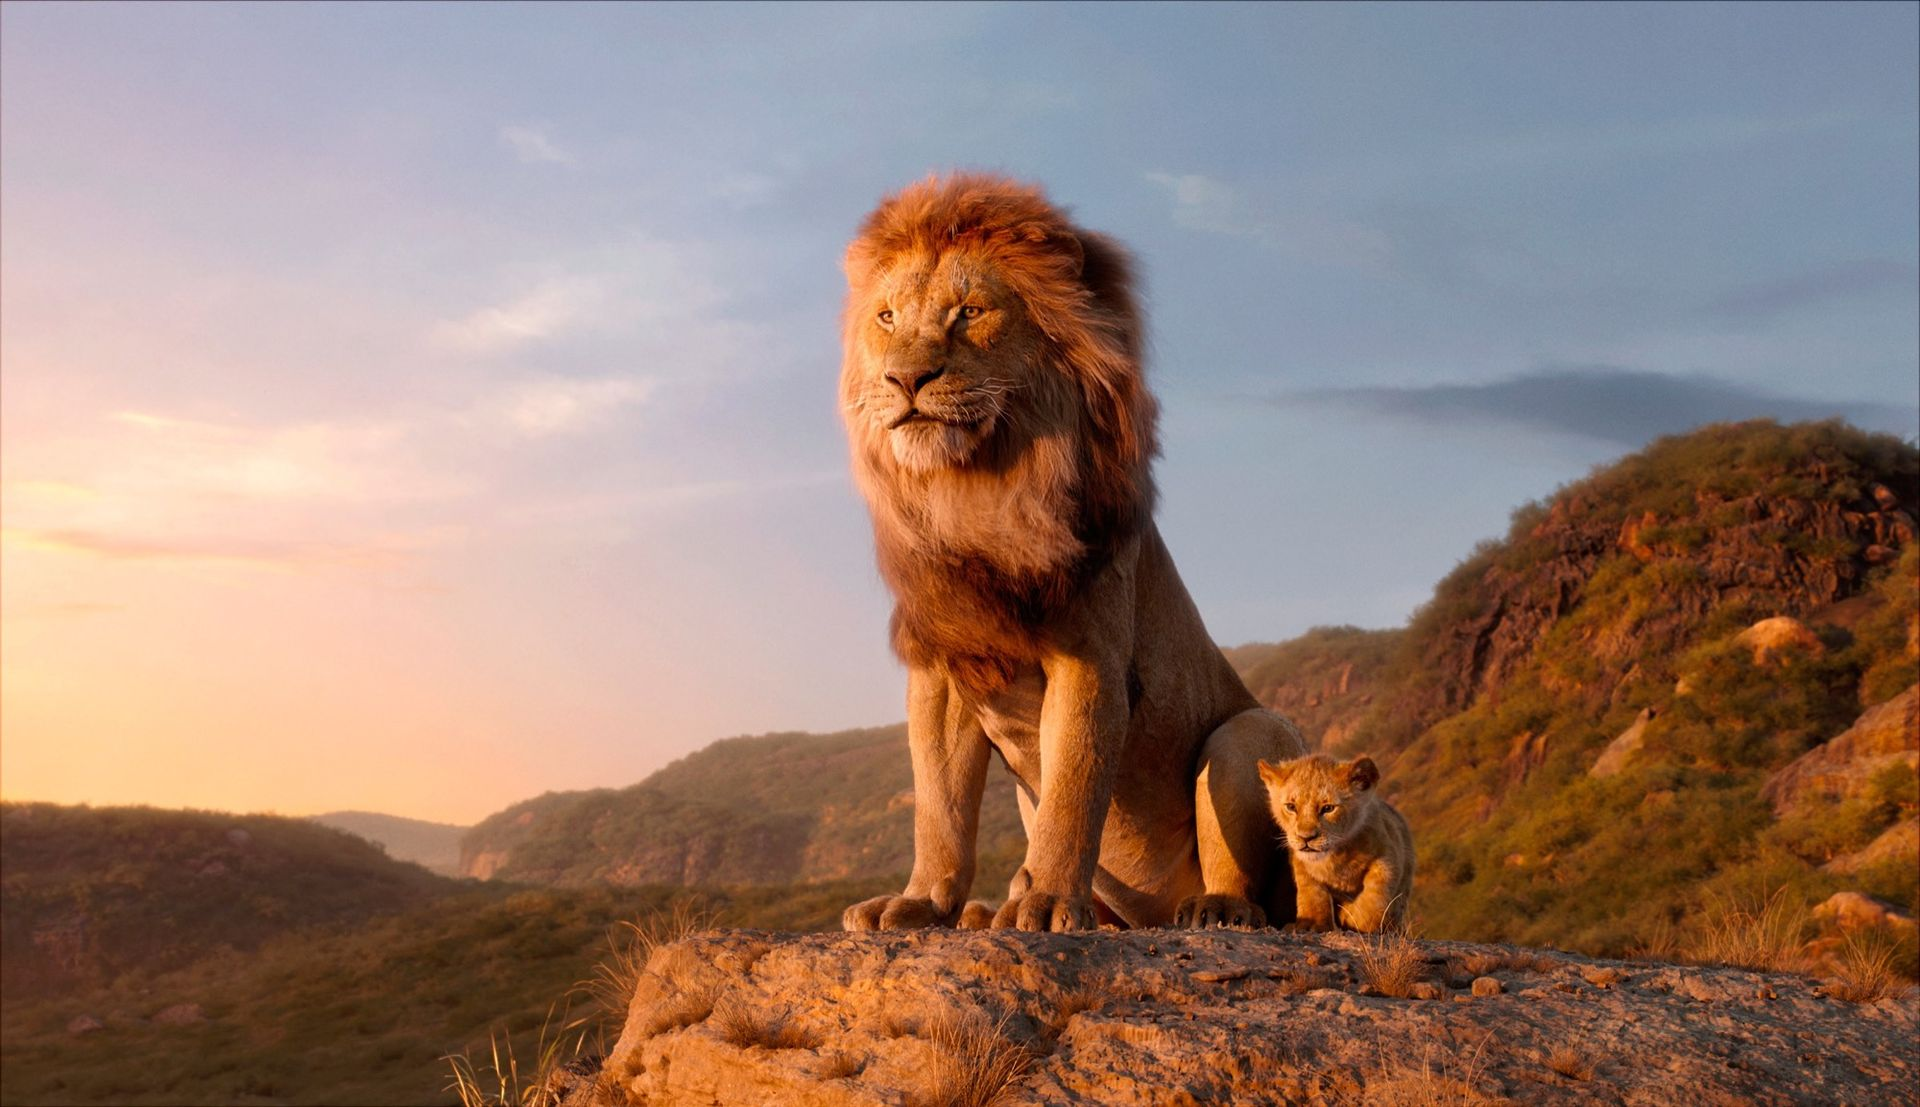 Endast en scen i The Lion King filmades på riktigt. Allt